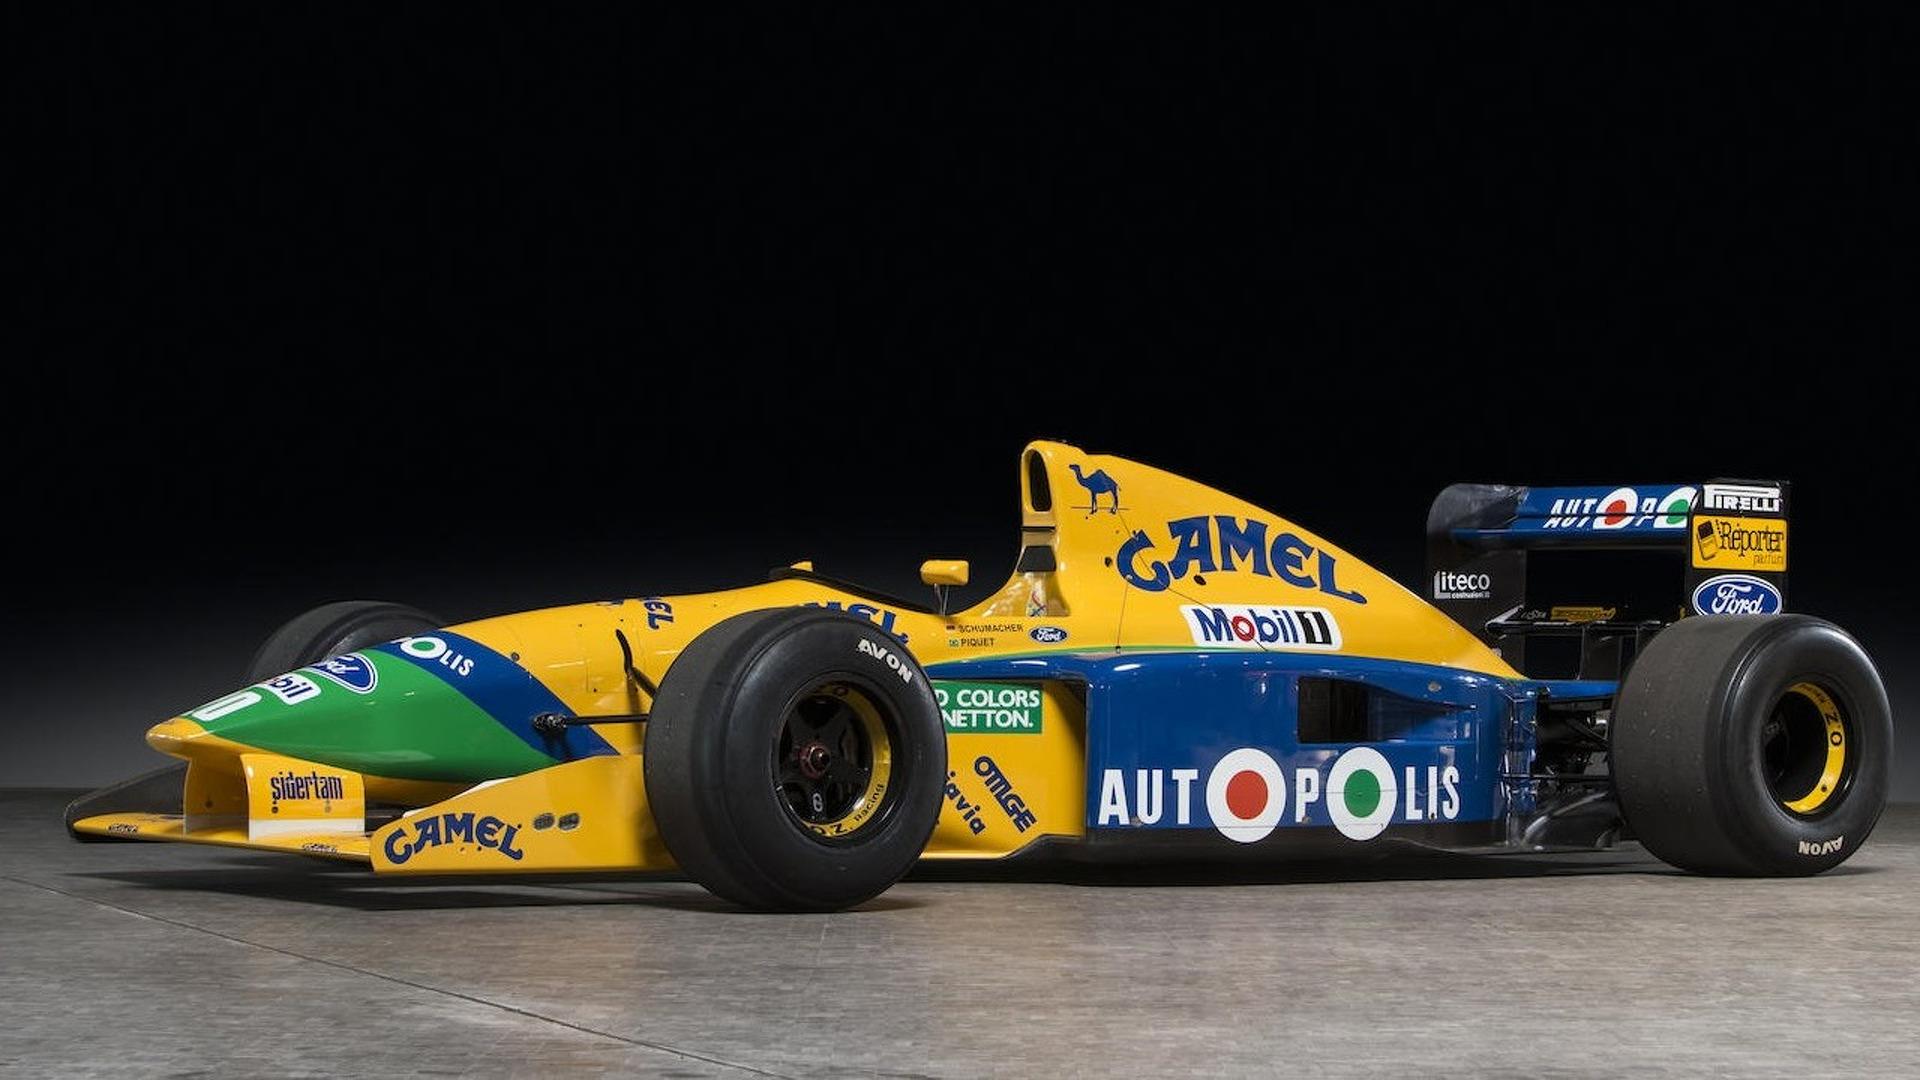 Benetton F1 Car Driven By Michael Schumacher For Sale